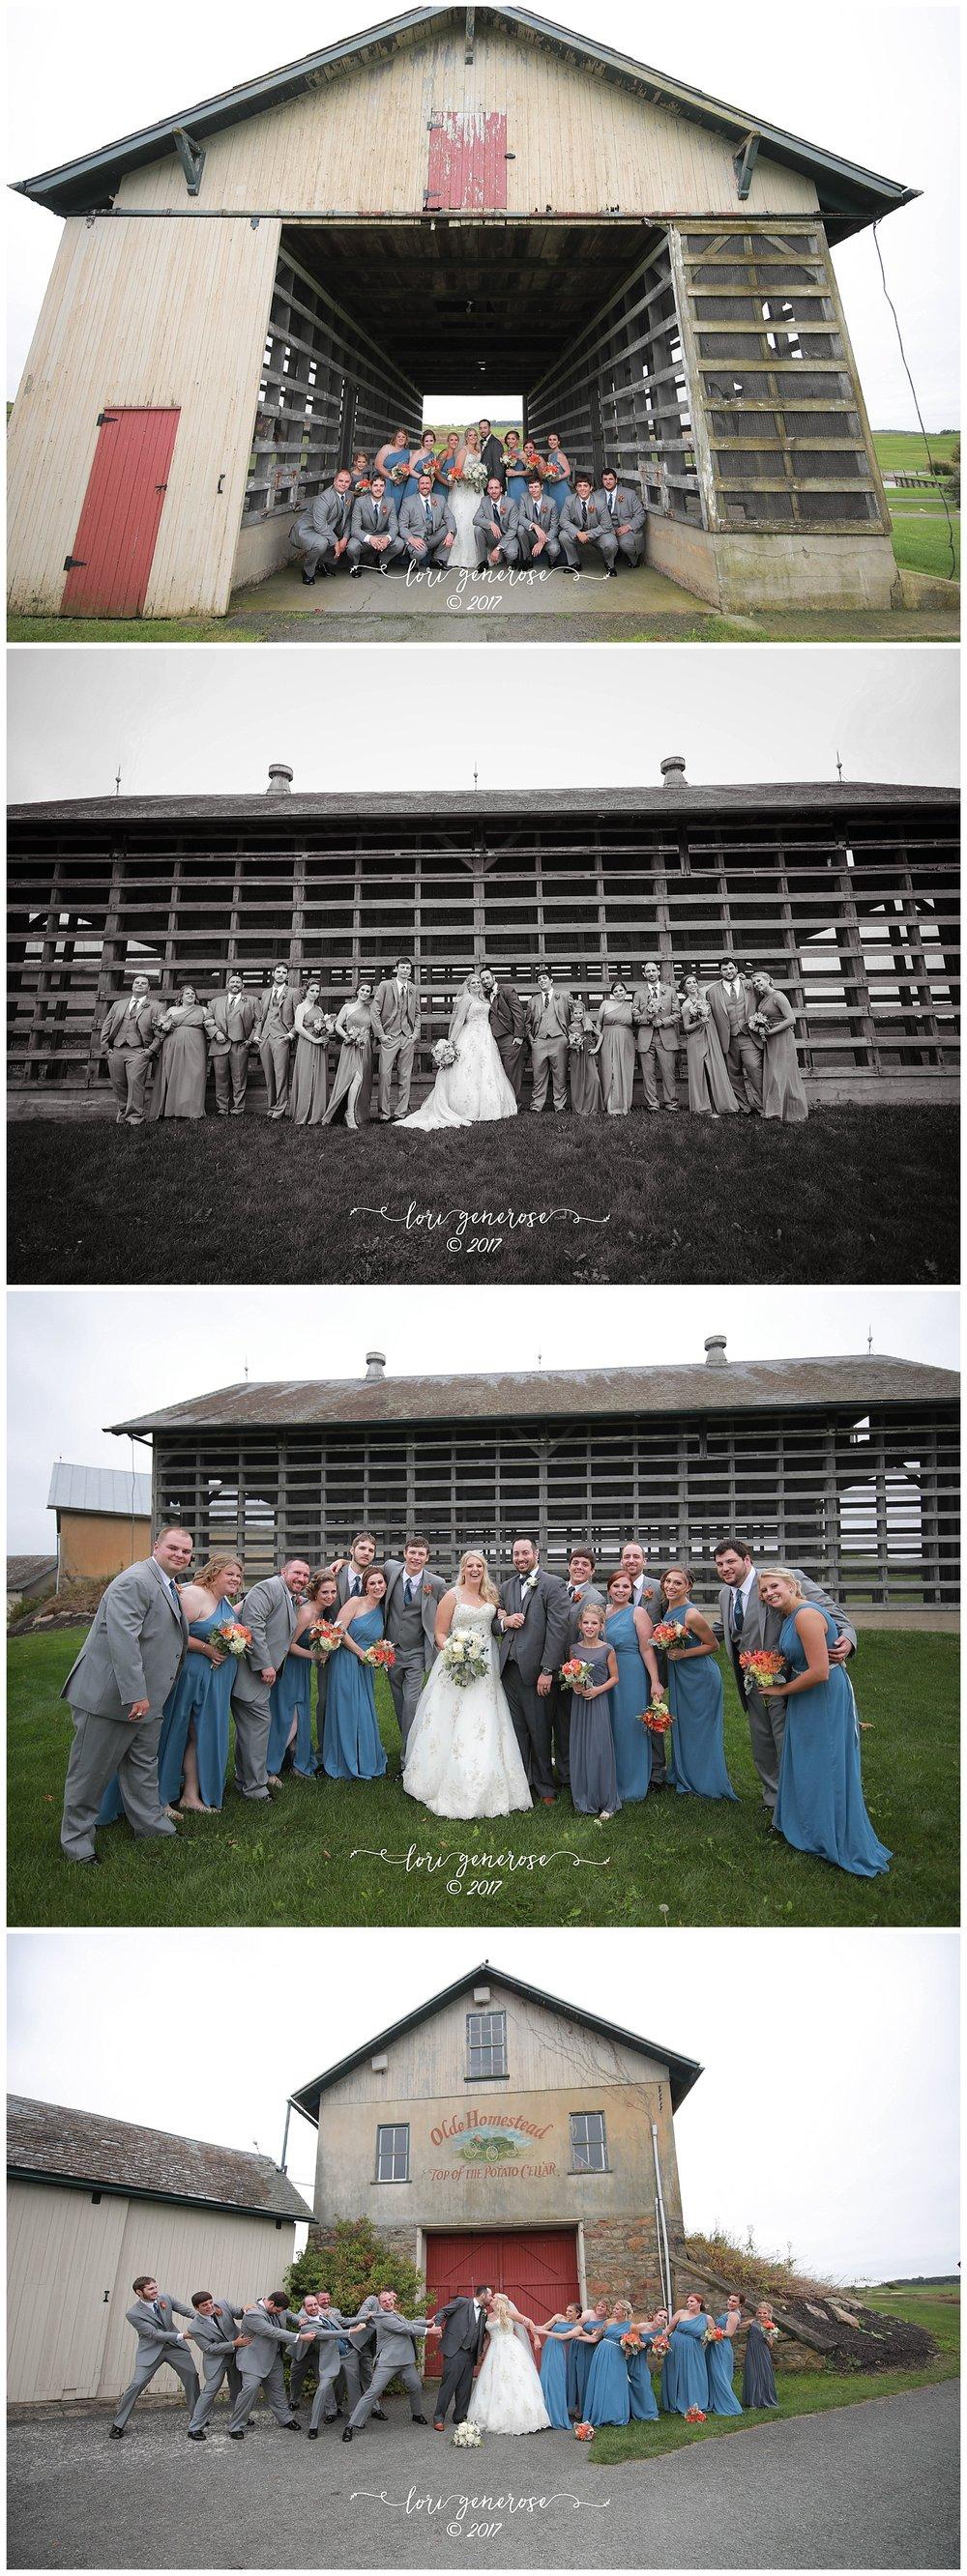 bridalpartyinbluedressesandgraytuxedosbarnphotosatoldehomesteadgolfclubfallwedding.jpg